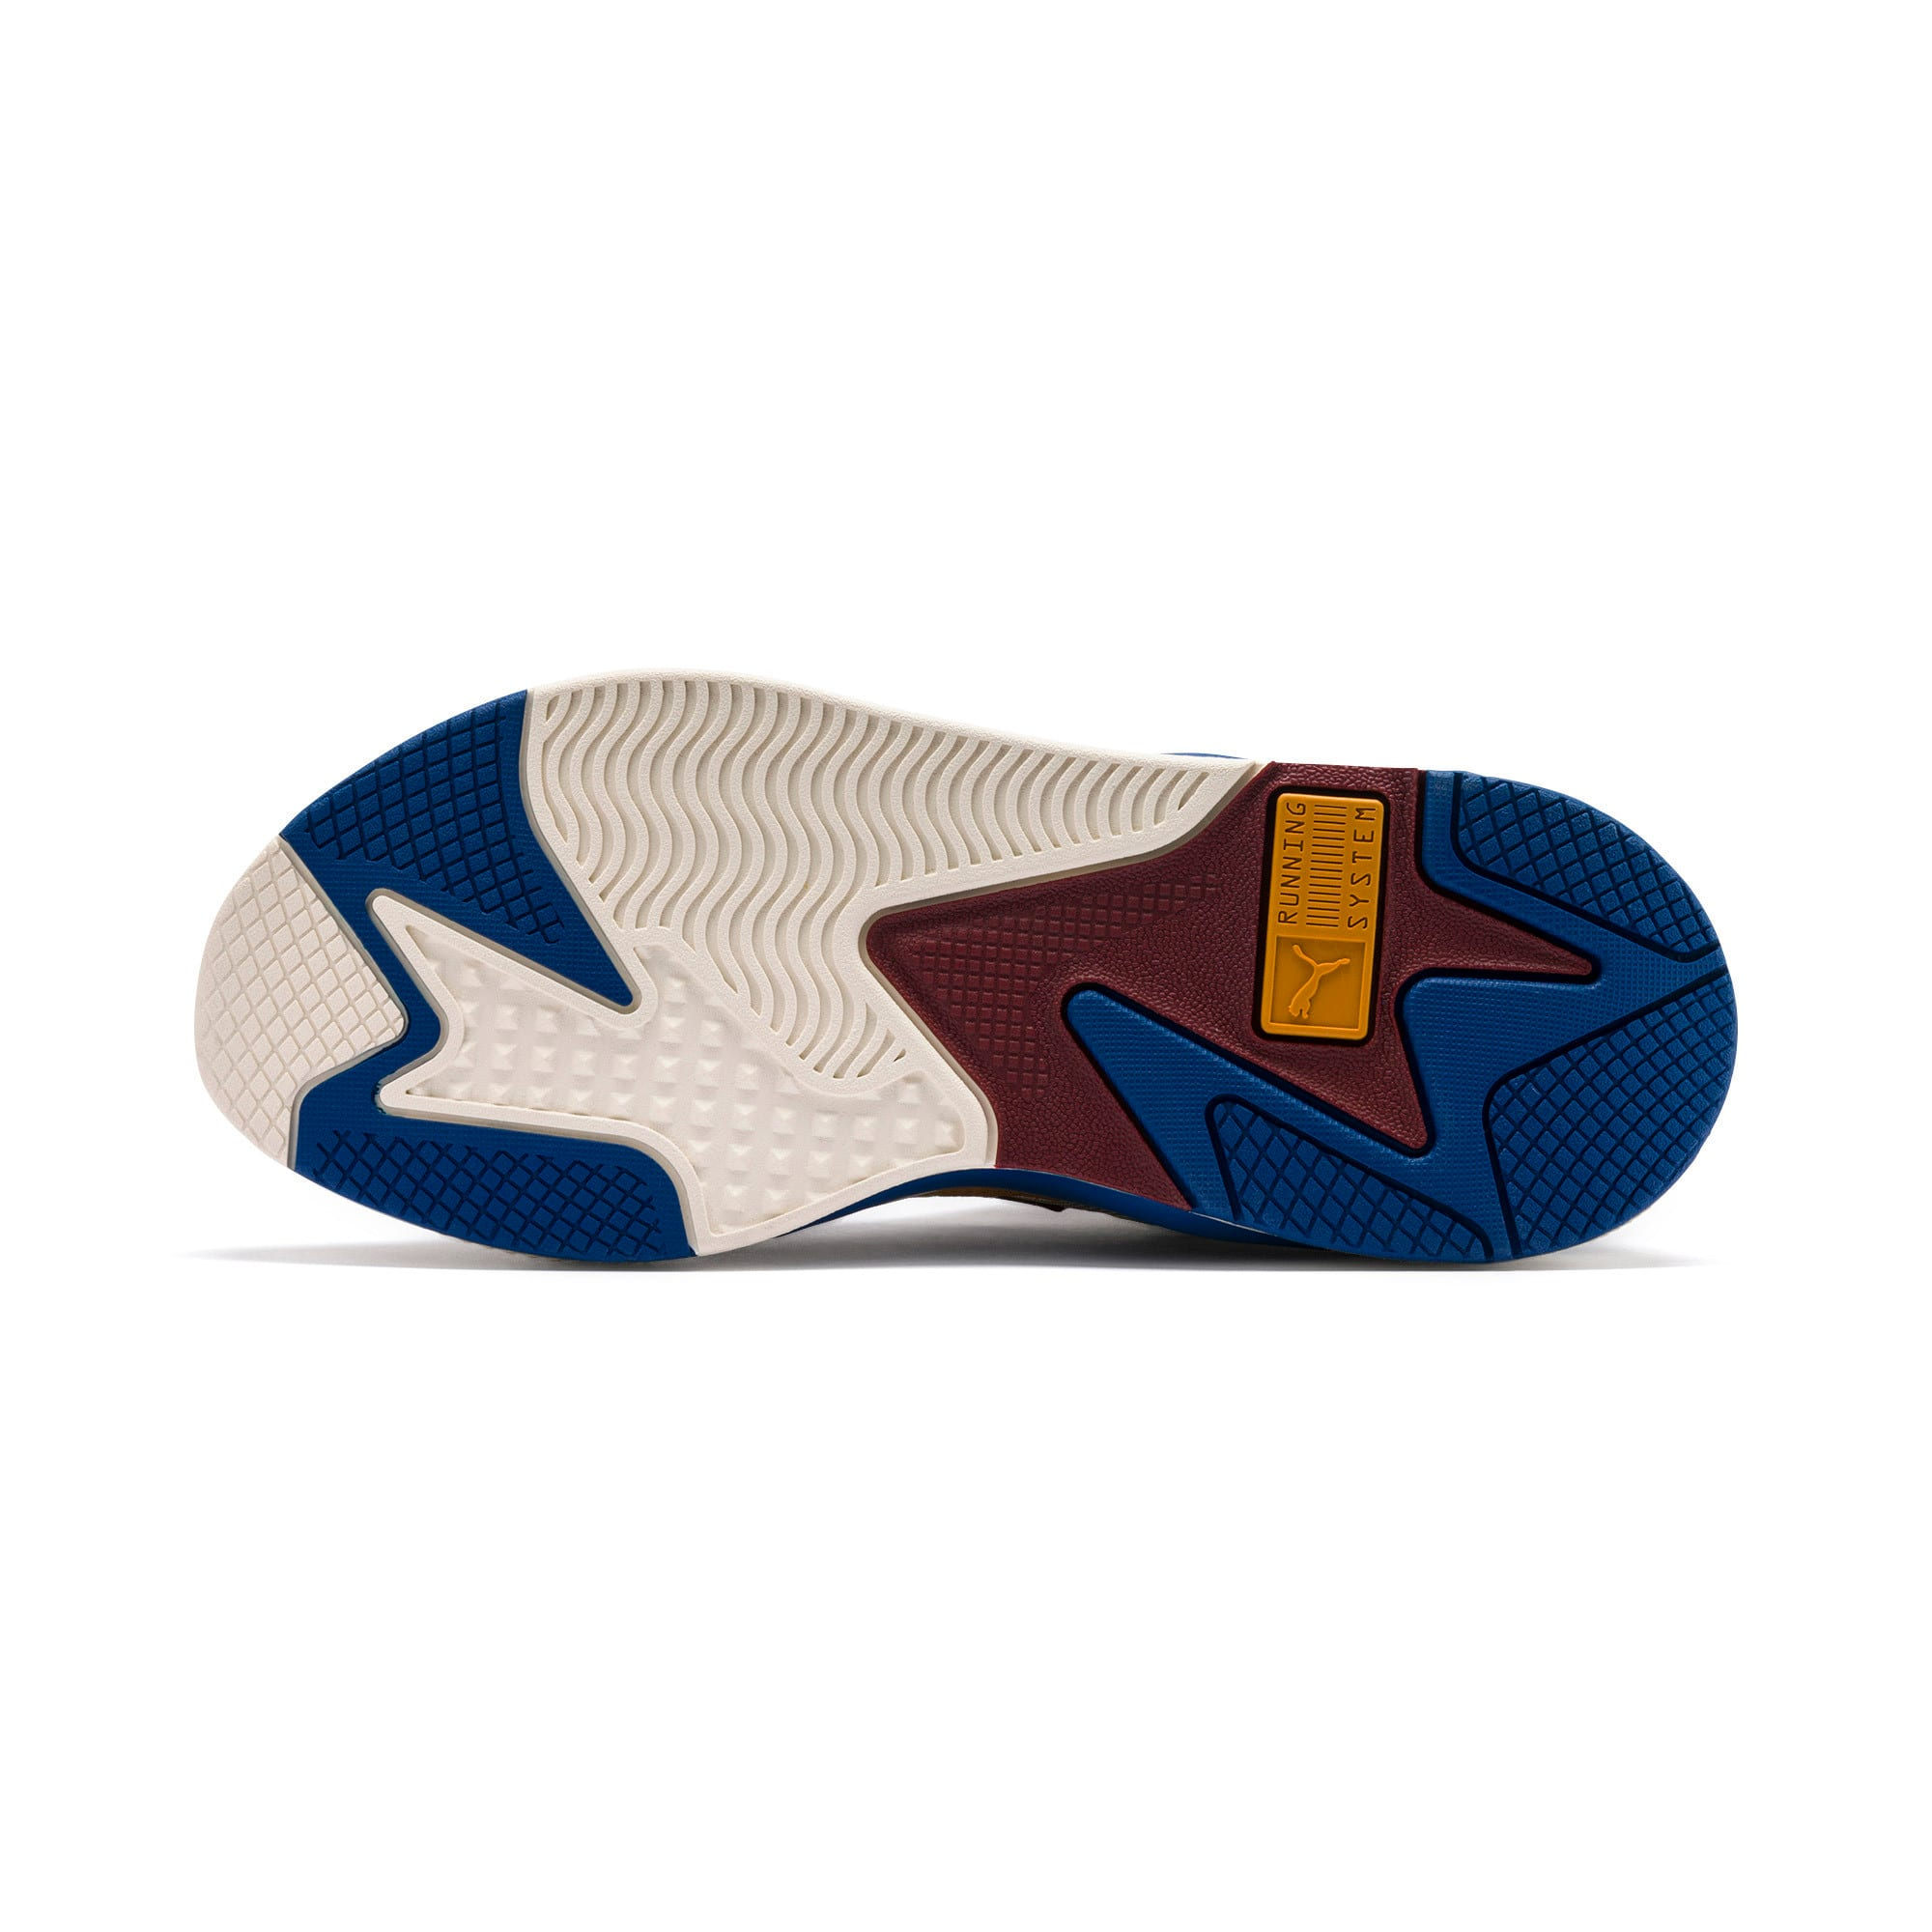 Miniatura 6 de Zapatos deportivos PUMA x TYAKASHA RS-X, Whisper White-Fired Brick, mediano